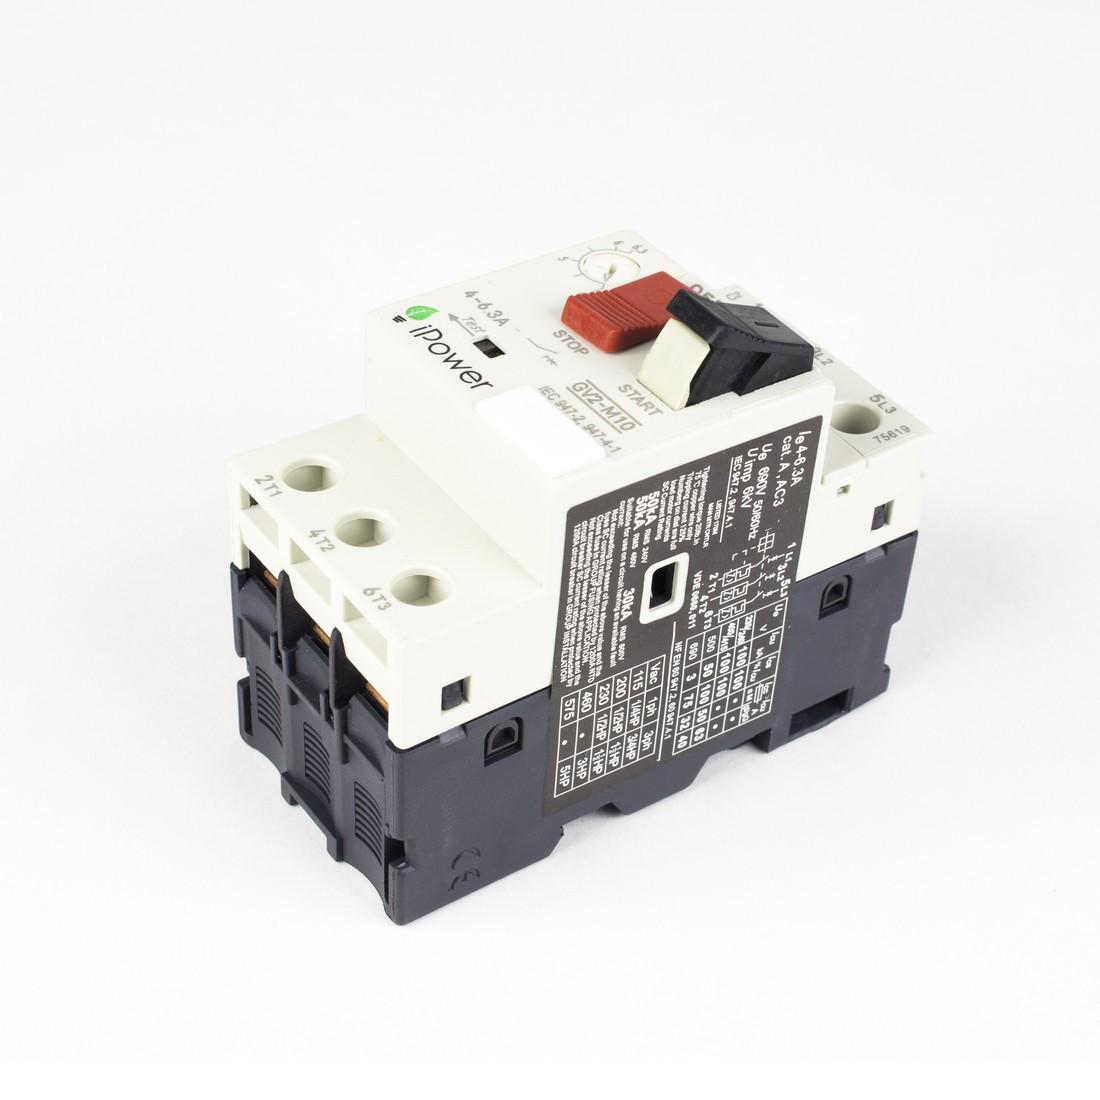 Автомат защиты двигателя iPower GV2-M08 (2.5-4A) - фото 3